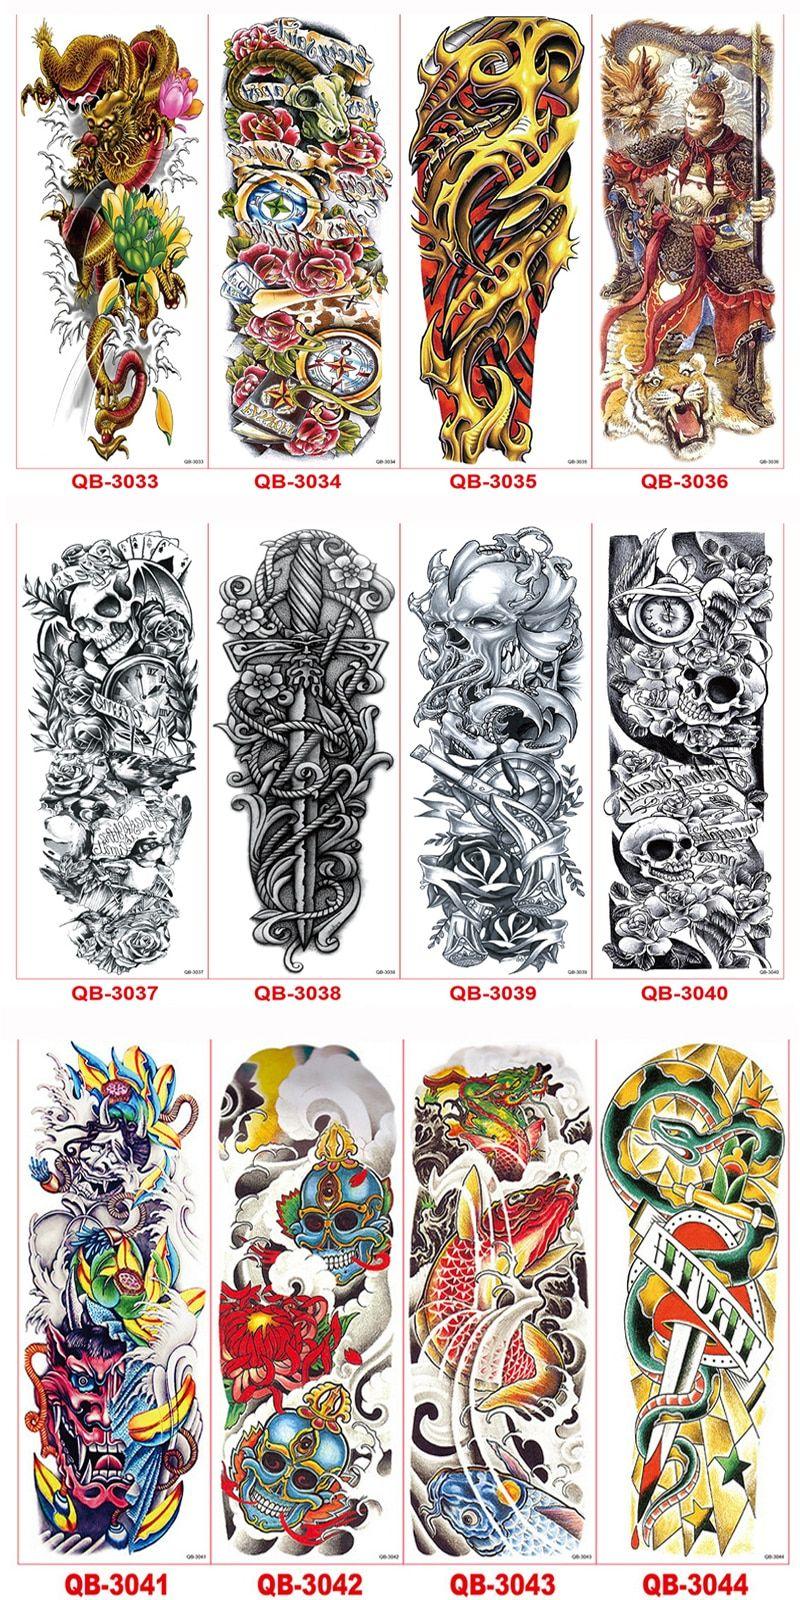 8ebfc0d46 5Pcs Waterproof Temporary Tattoos Paste Leg Full Arm Paper Fake Tattoo  Stickers For Men Women Tattoo Sleeve Body Art Tatuagem